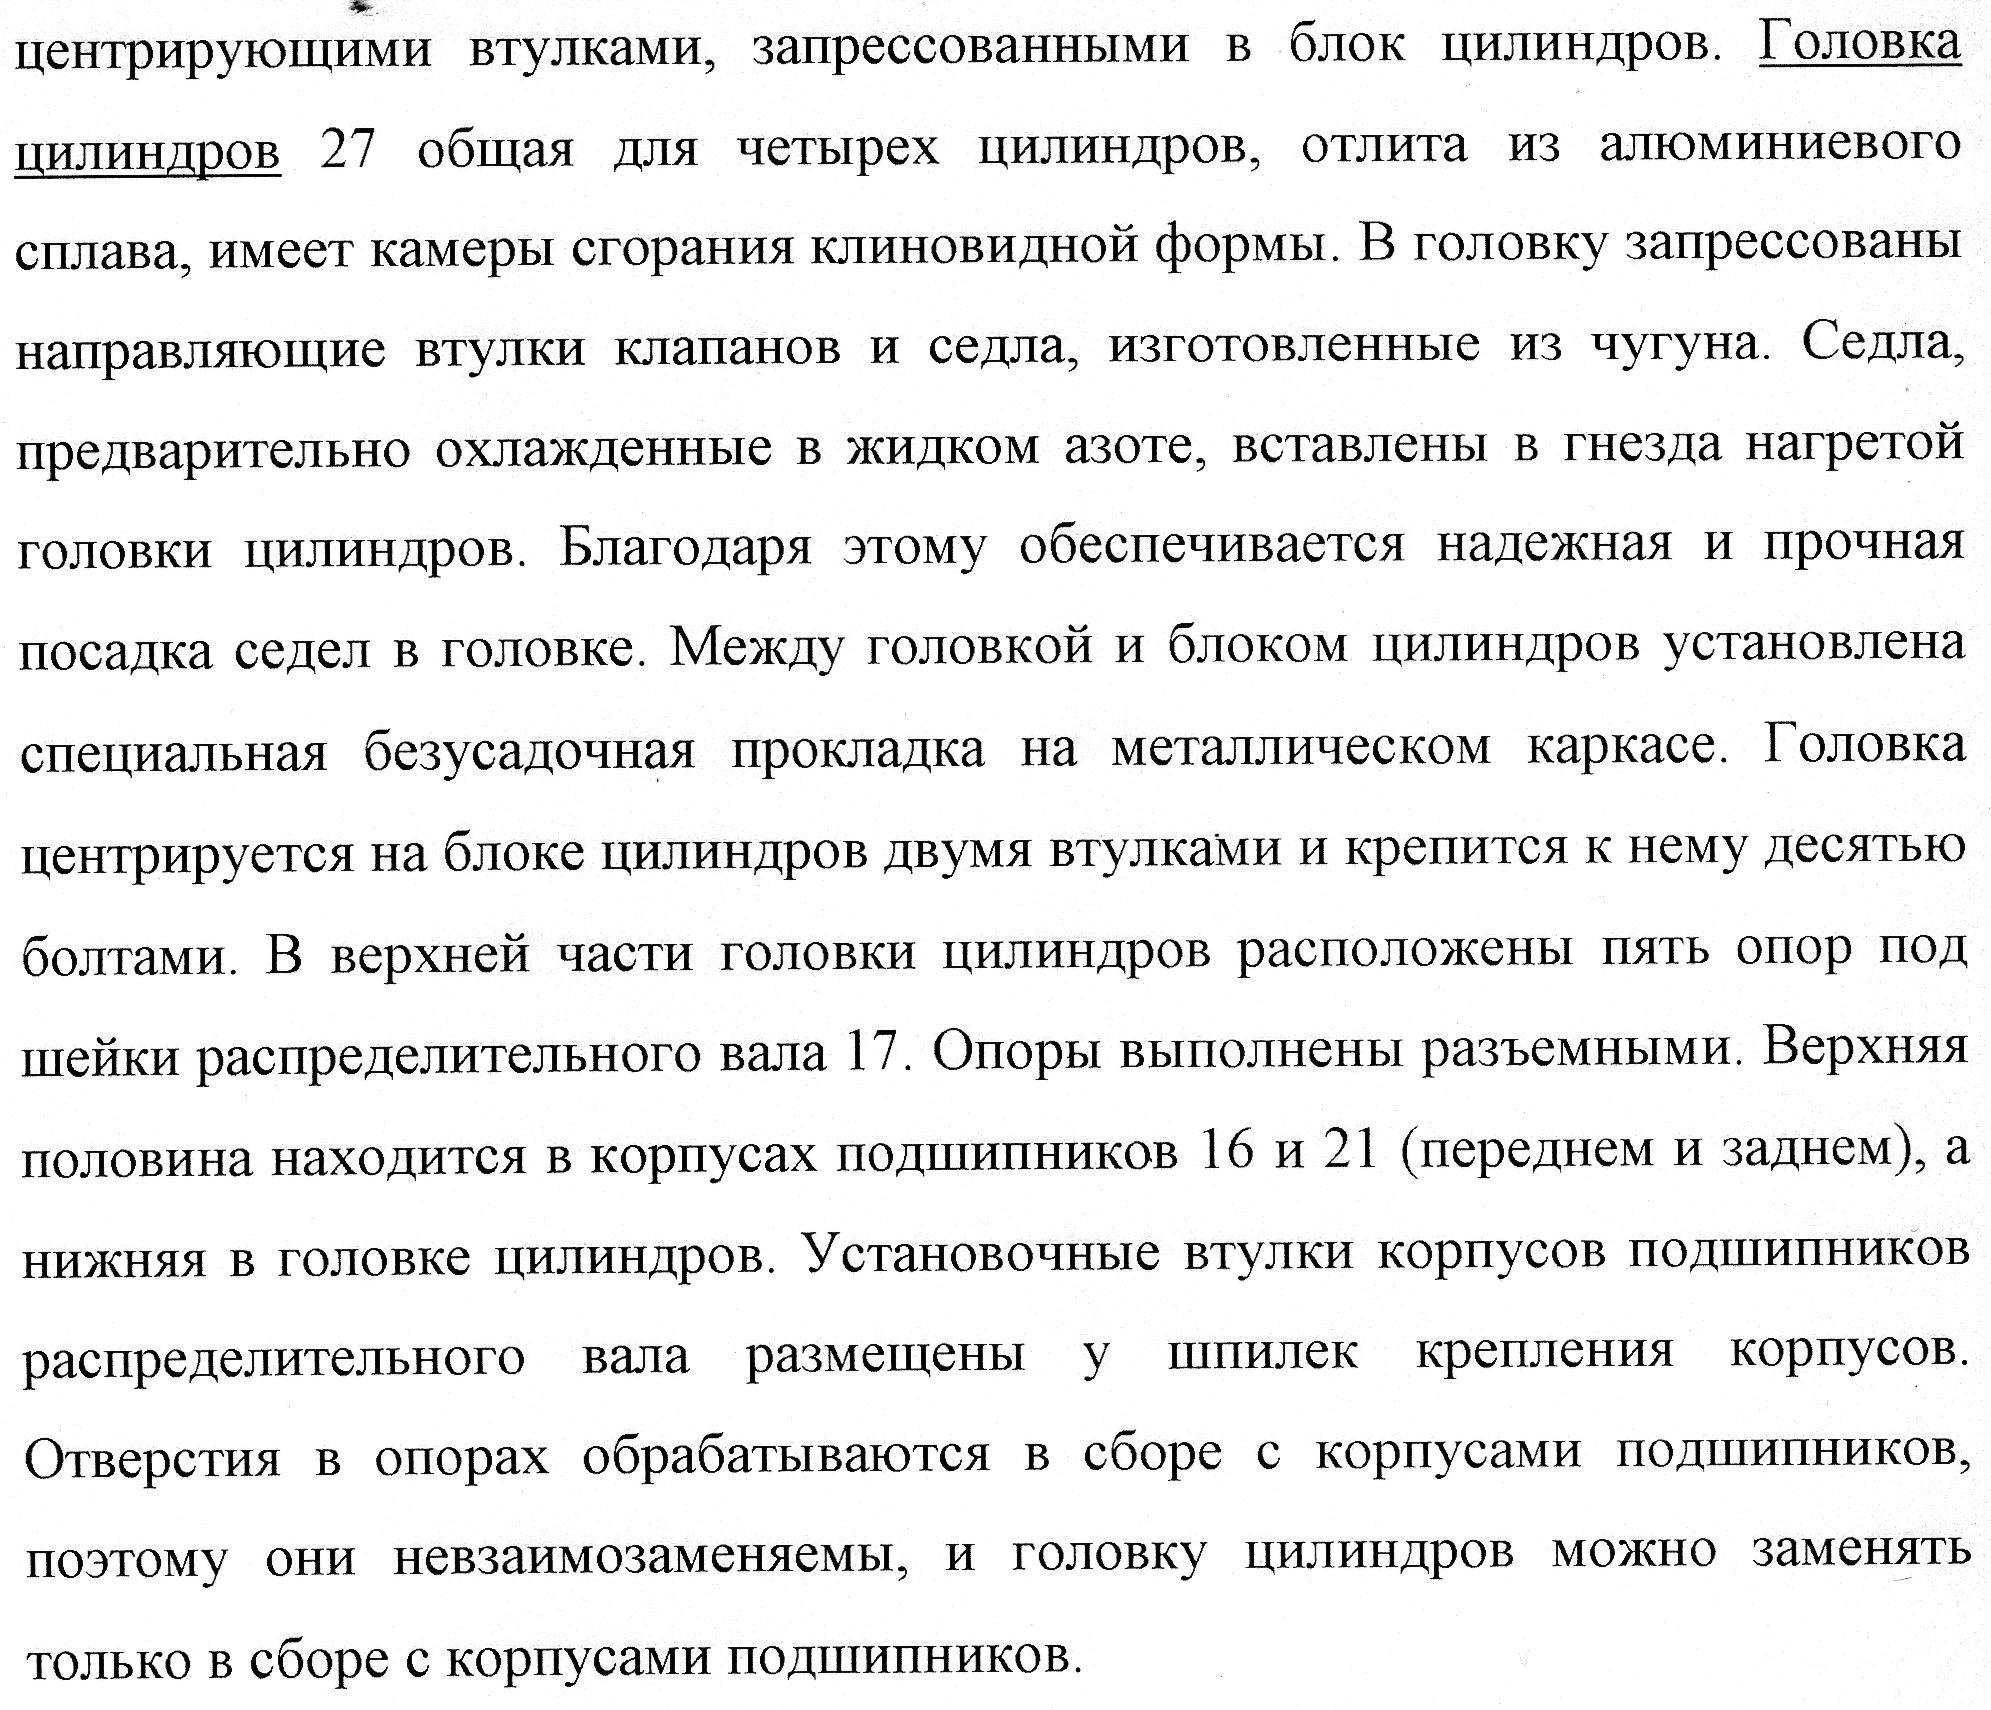 C:\Users\Василий Мельченко\Pictures\img600.jpg